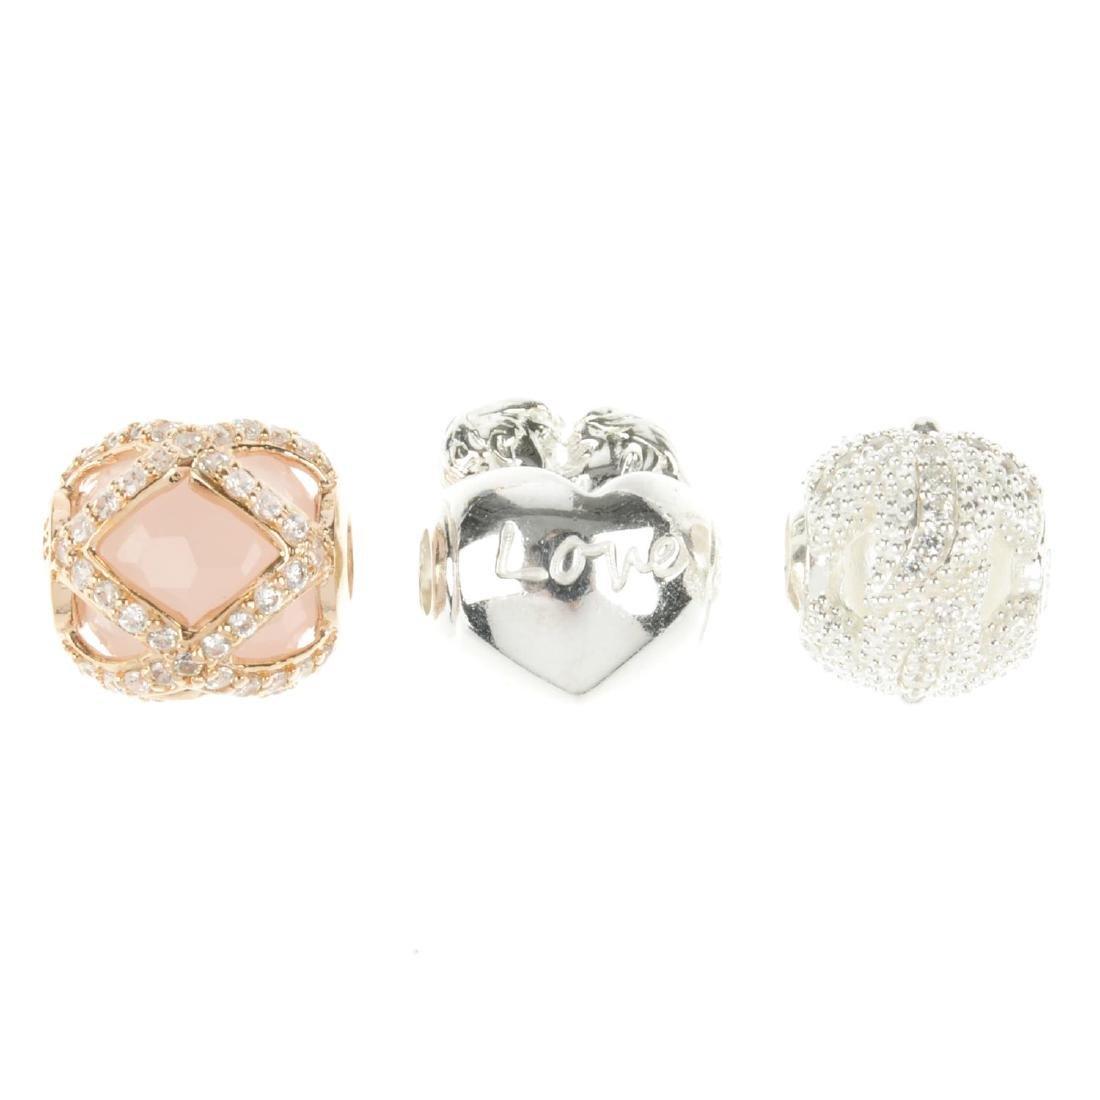 THOMAS SABO - thirty charms. To include a rose quartz